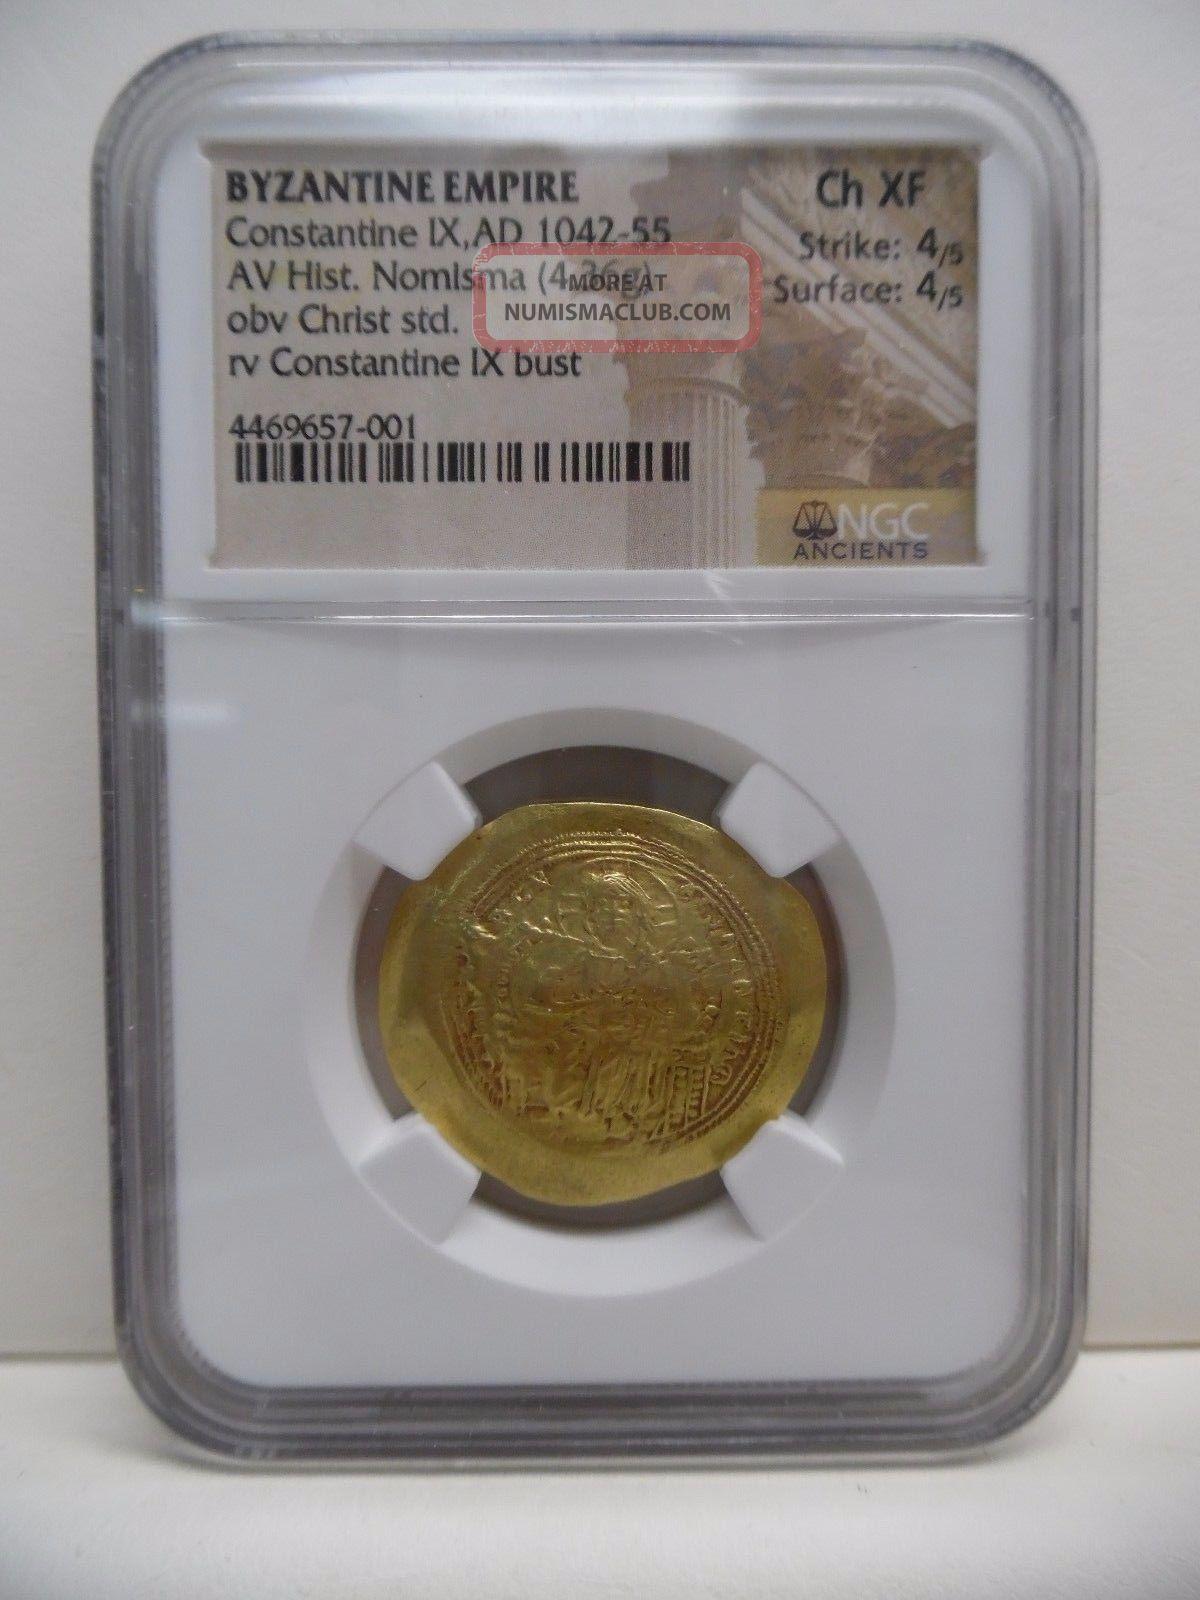 Byzantine Empire Constantine Ix,  Ad 1042 - 55 Coins: Ancient photo